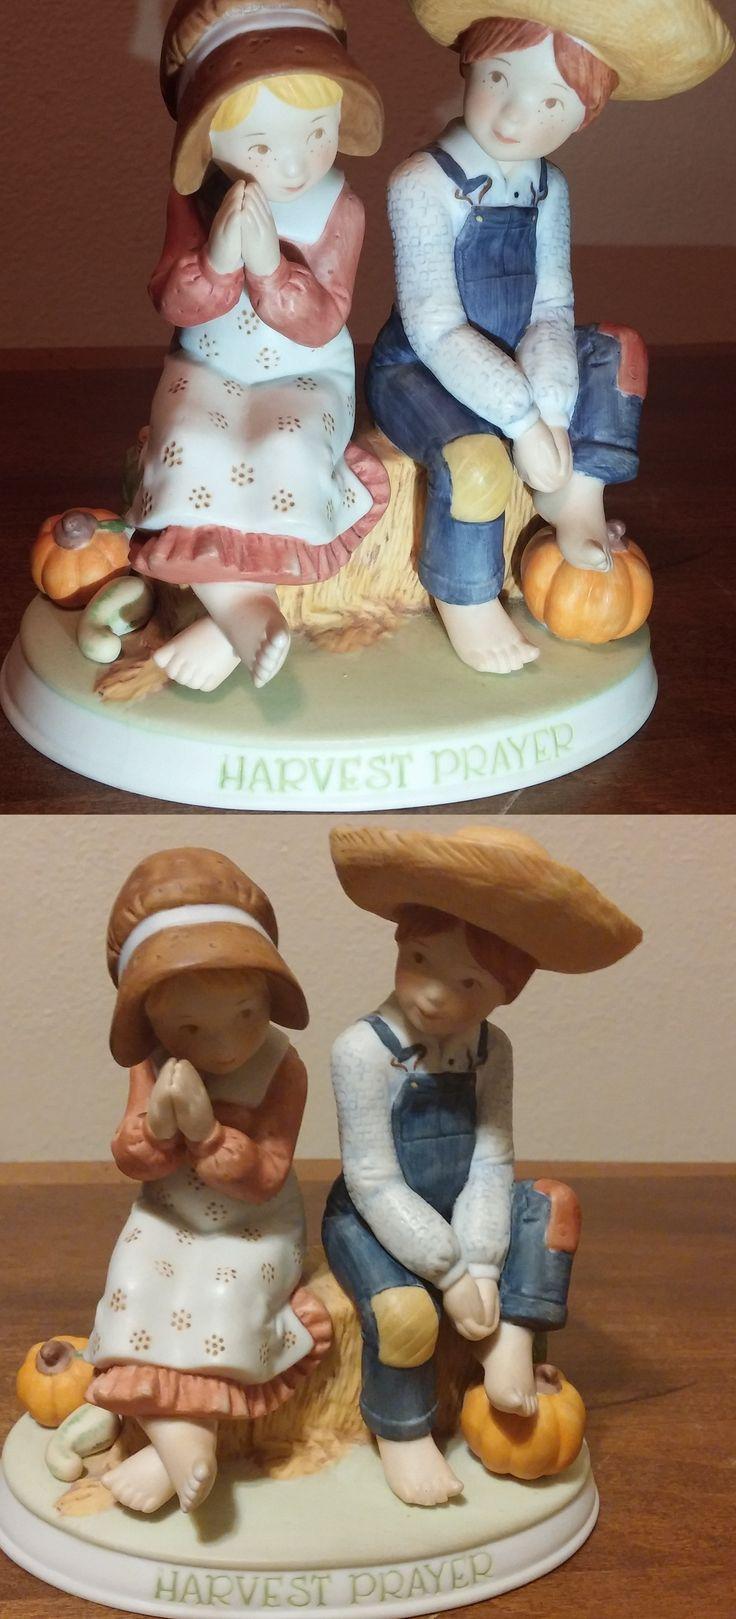 49 best i love holly hobbie images on pinterest holly hobbie holly hobbie harvest prayer 1983 reviewsmspy